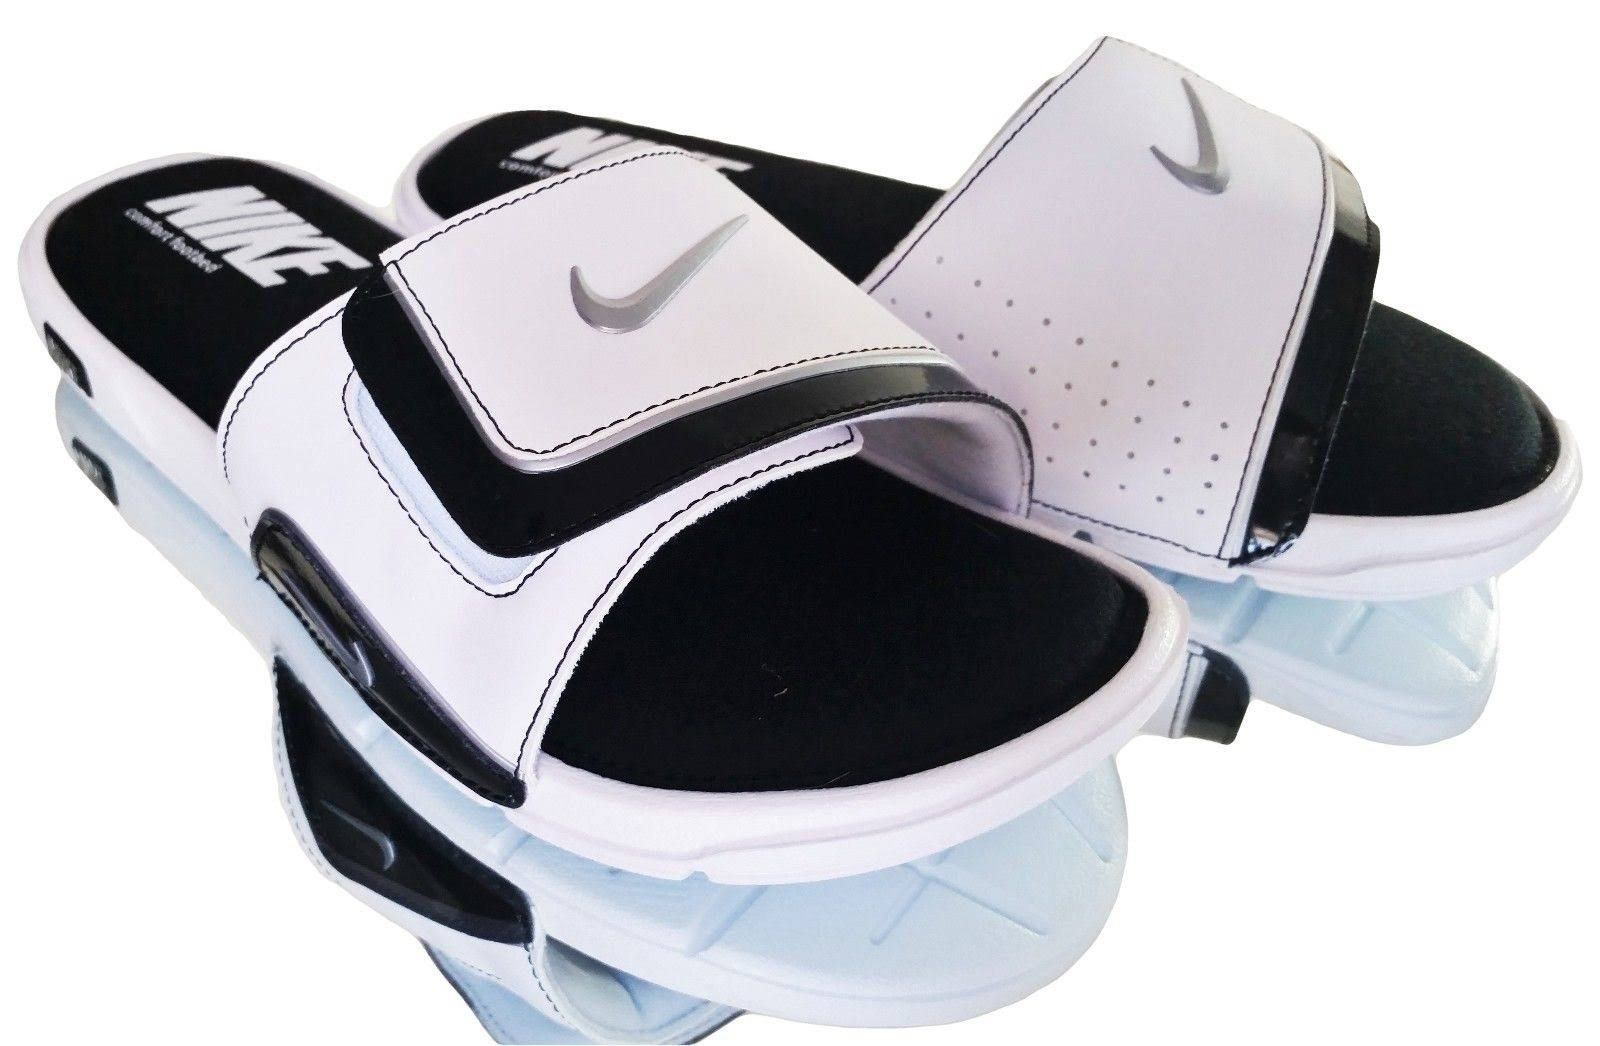 2 Nike White 100 Slide Comfort 415205 Sandals Solid Men's New Black dtcq4wx6xa